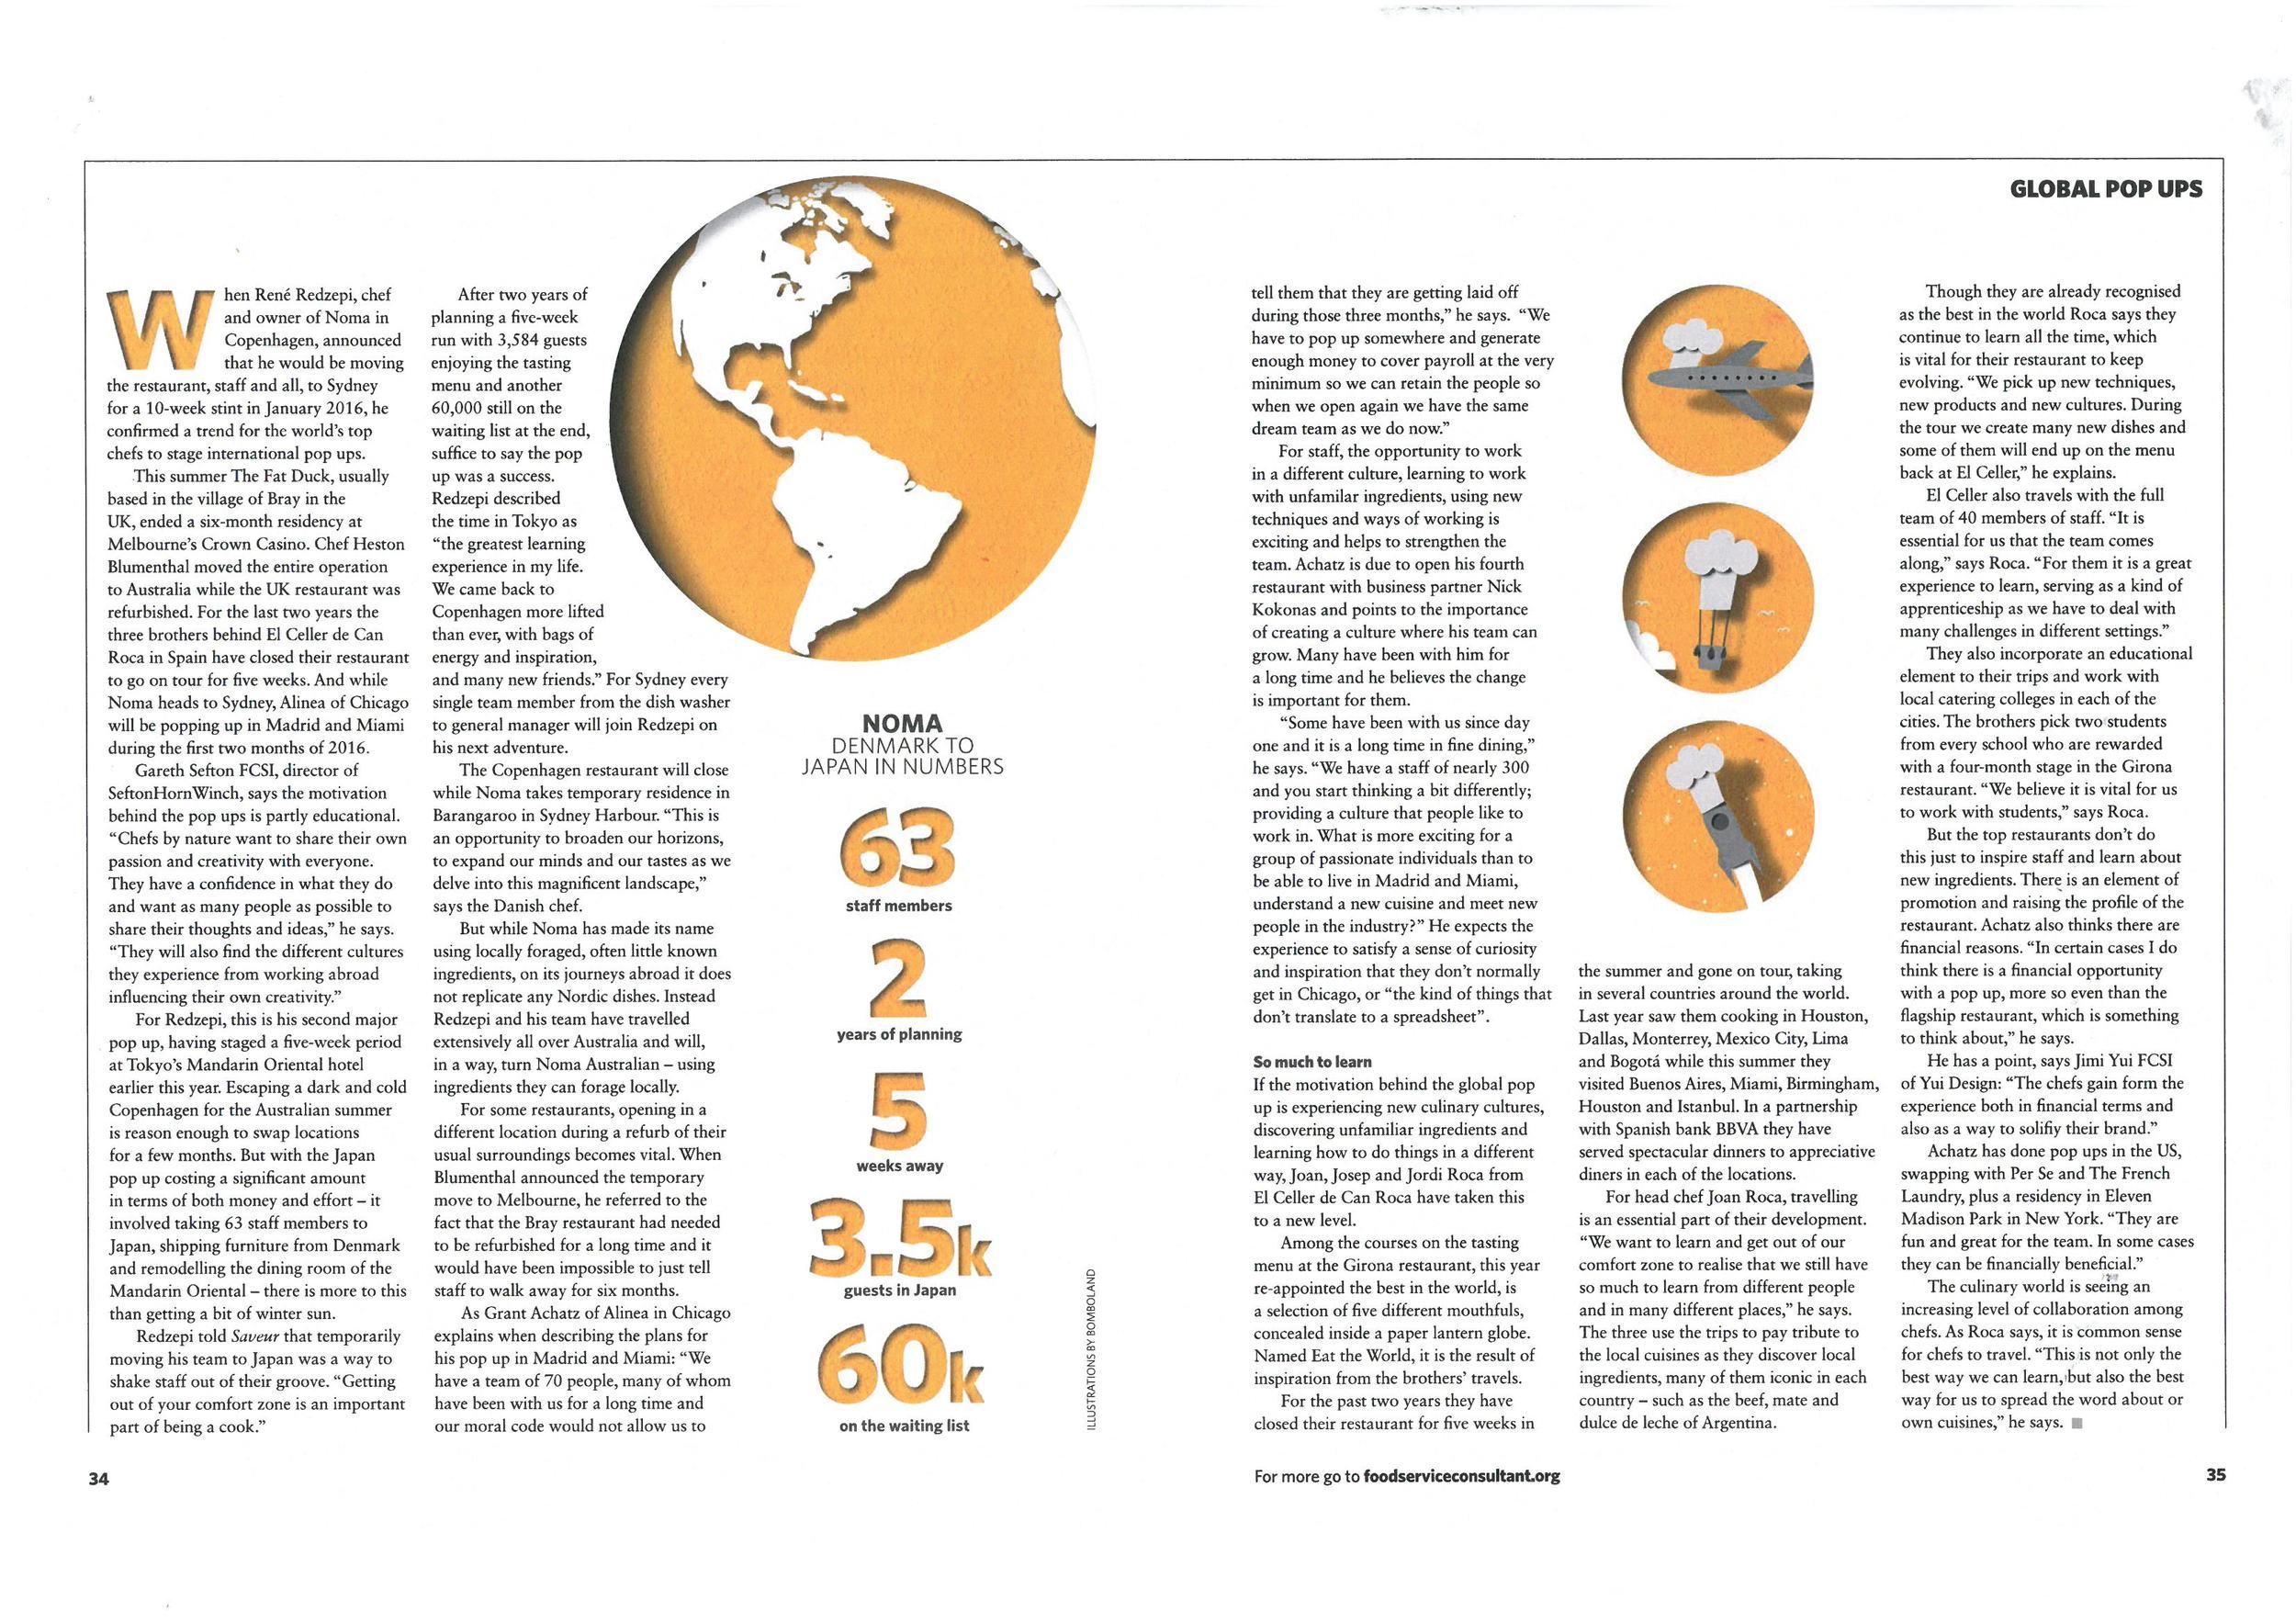 Courtesy of Foodservice Consultant magazine